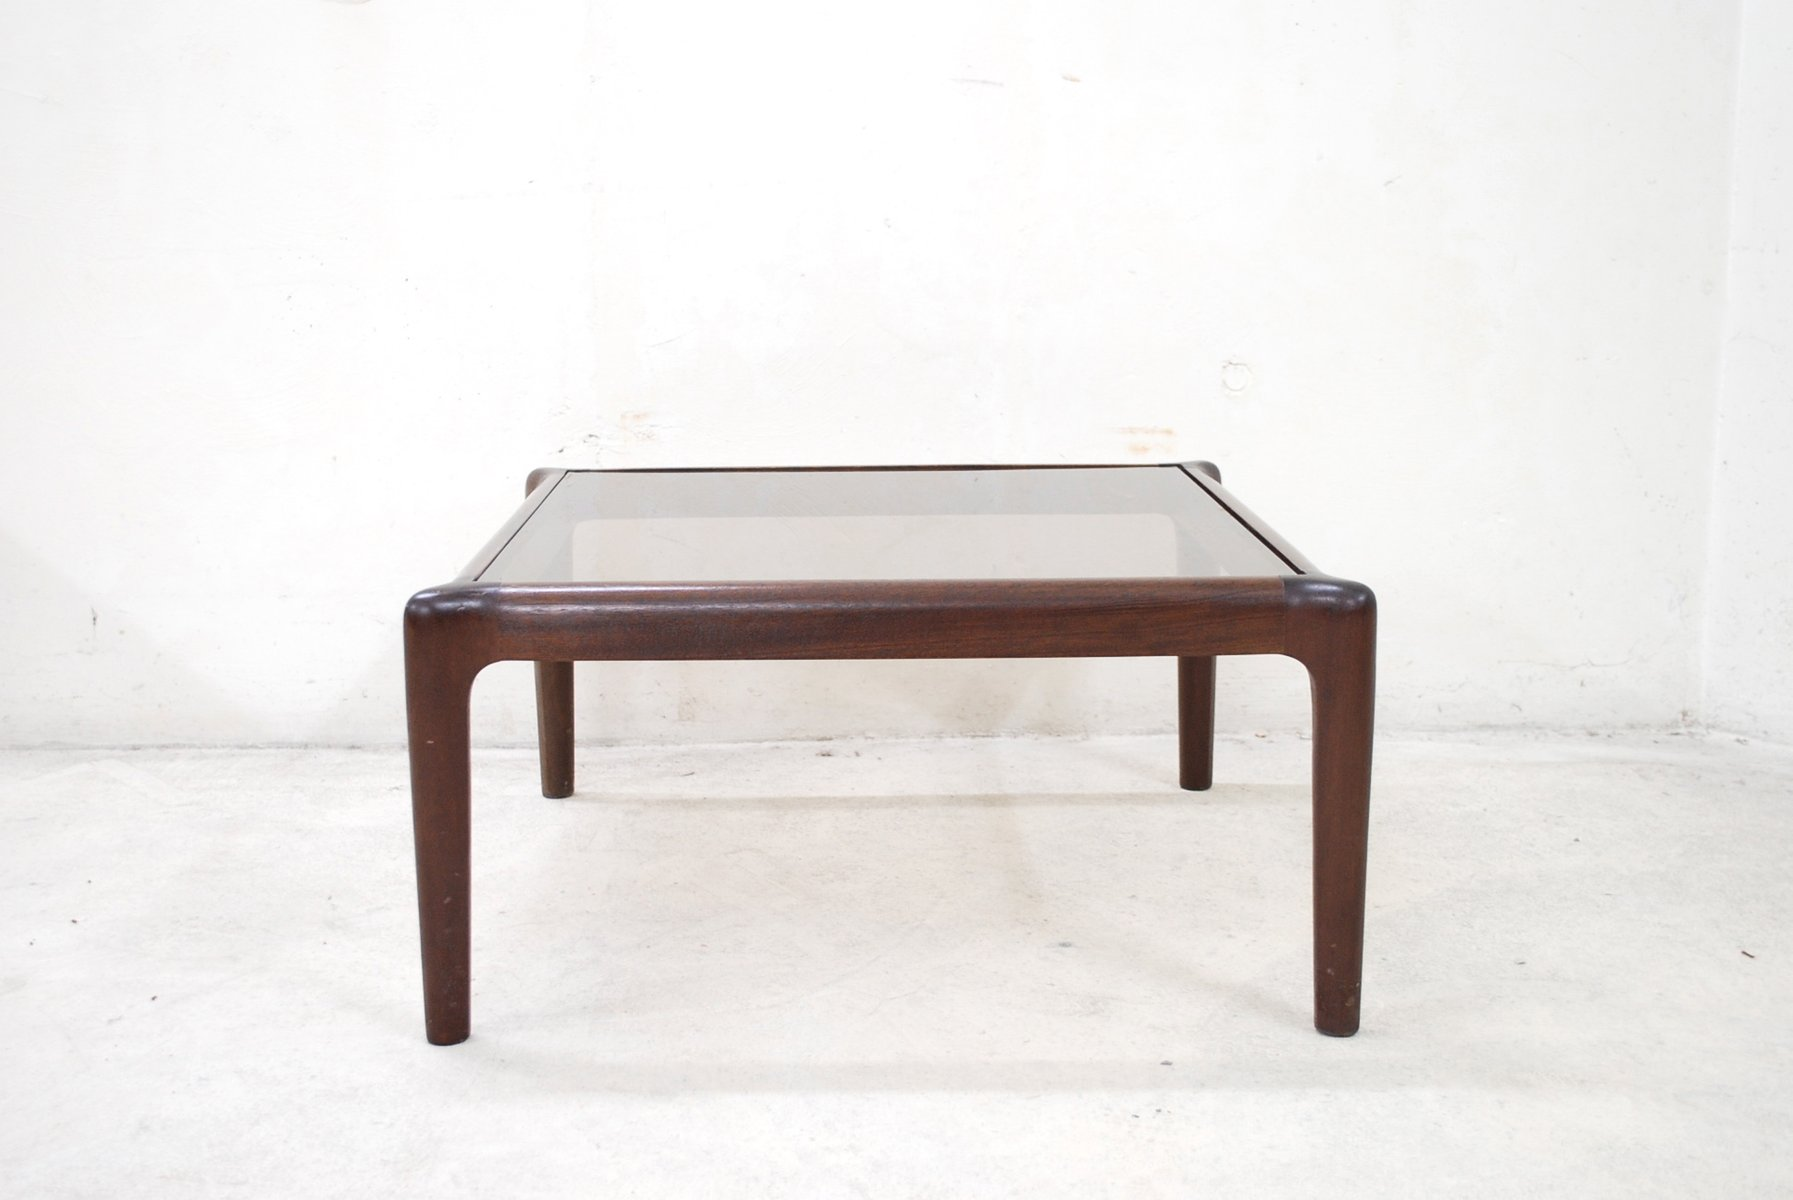 Table basse vintage en acajou verre fum en vente sur pamono - Table basse verre fume ...